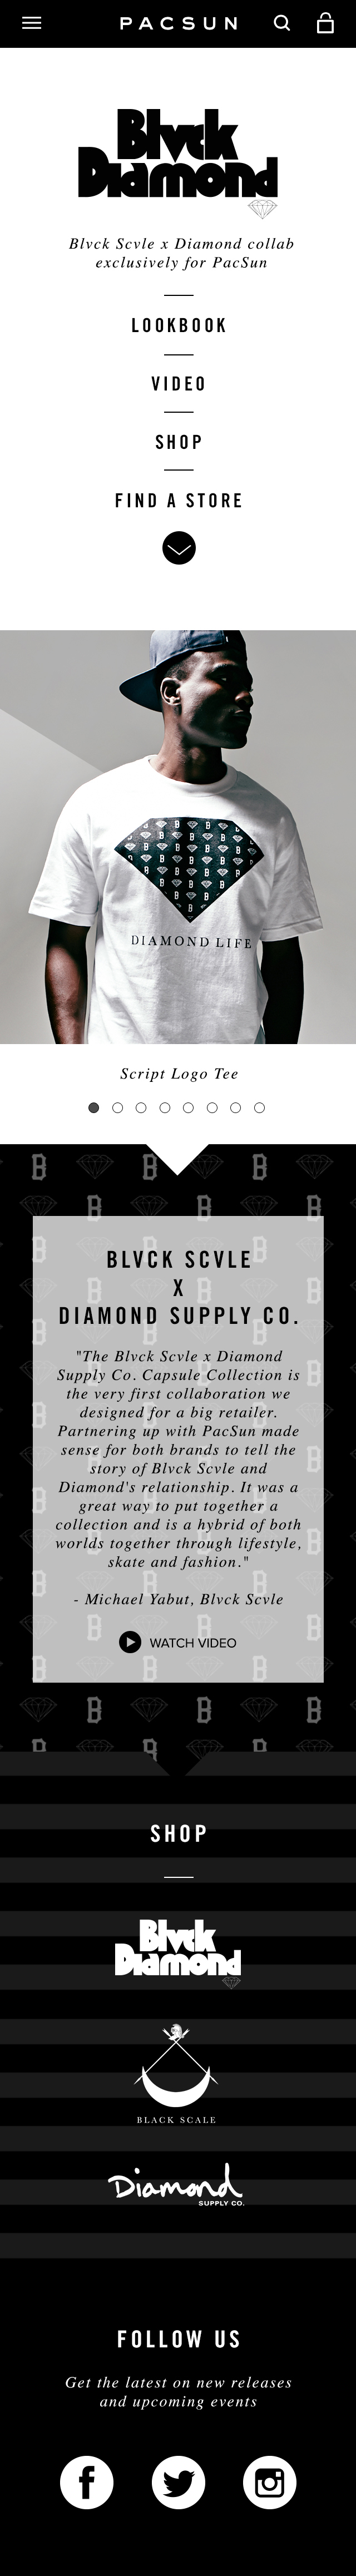 blackdiamond-mobile.jpg